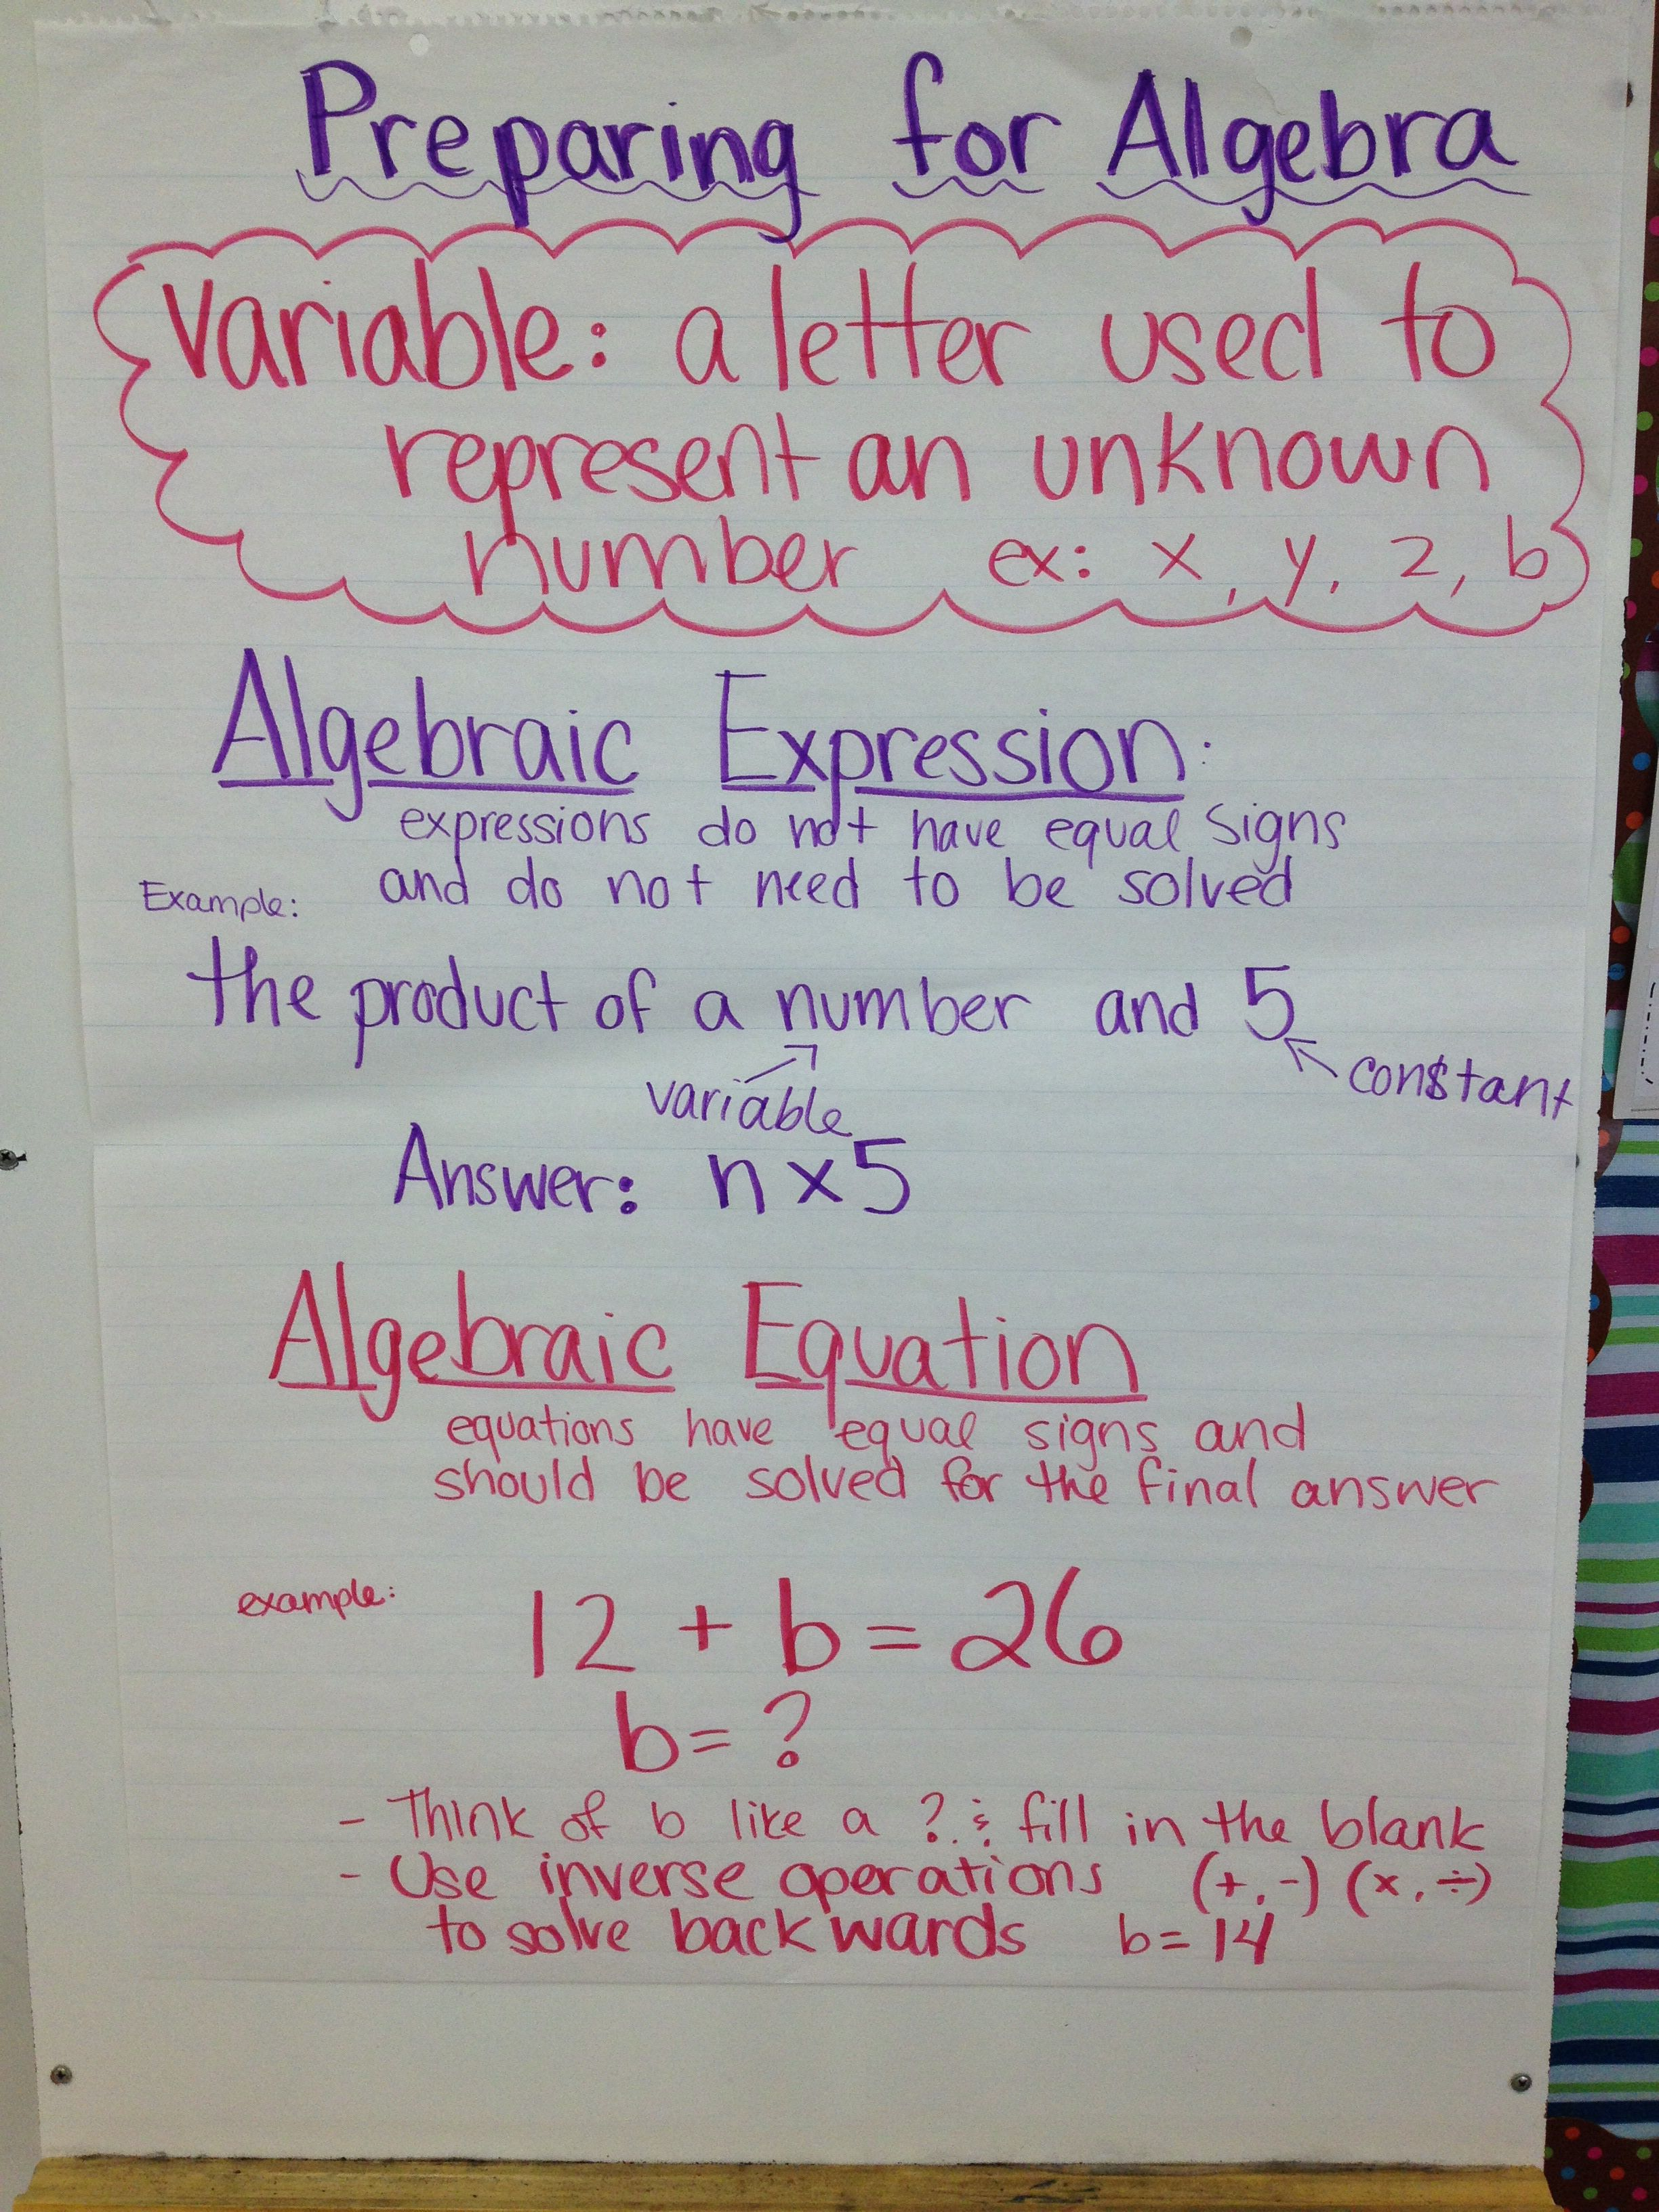 Variable Expressions And Equations Anchor Chart Preparing For Algebra Math Expressions Algebra Sixth Grade Math Writing algebraic expressions grade 6